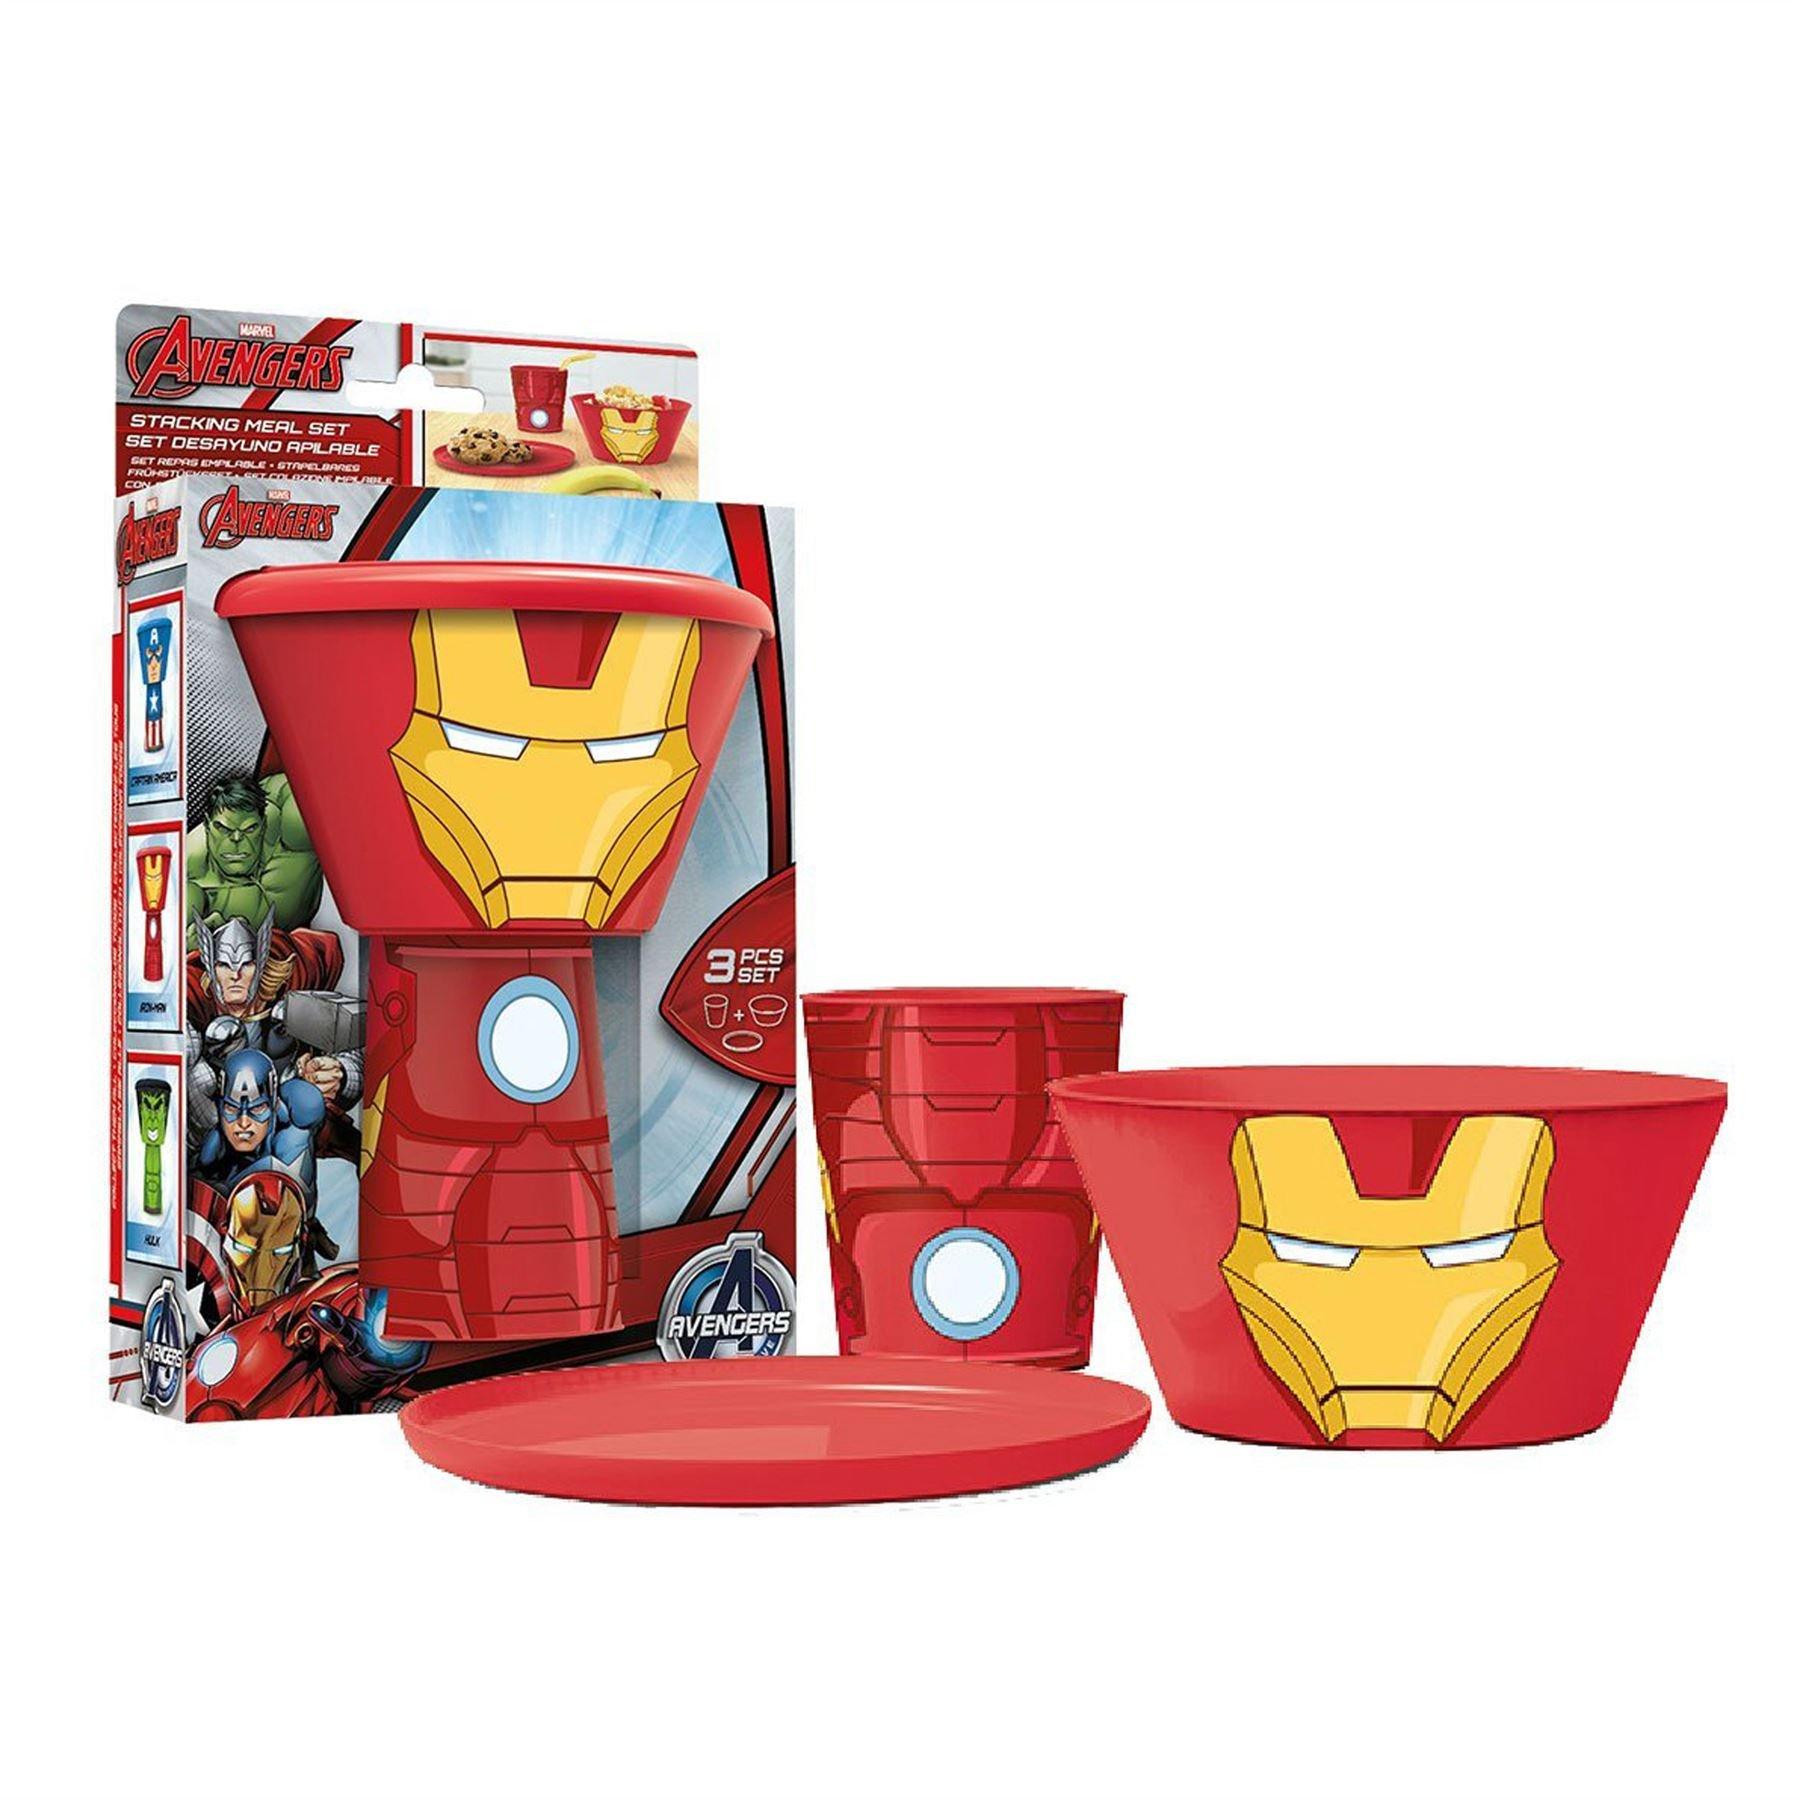 Marvel® Avengers Iron Man 3PC Stacking Meal Set: Plate, Bowl & Tumbler